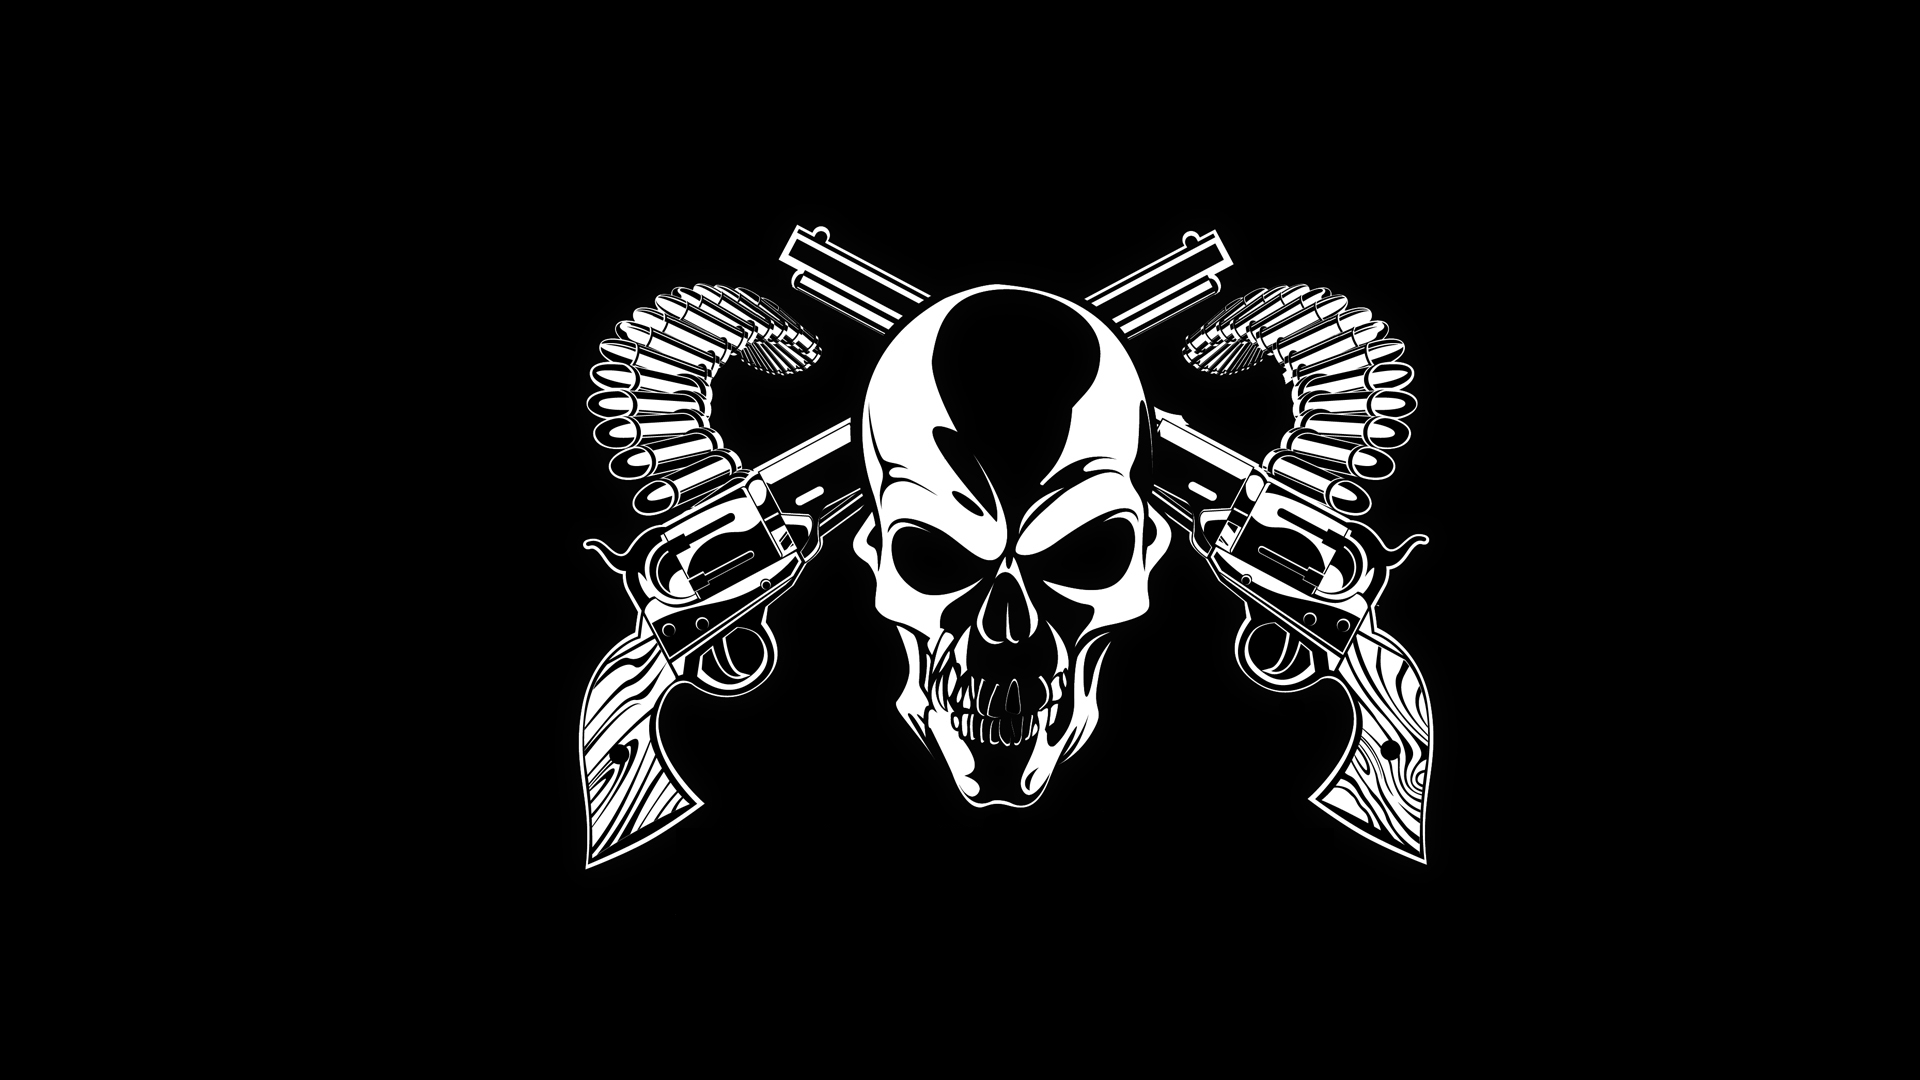 Harley davidson swat